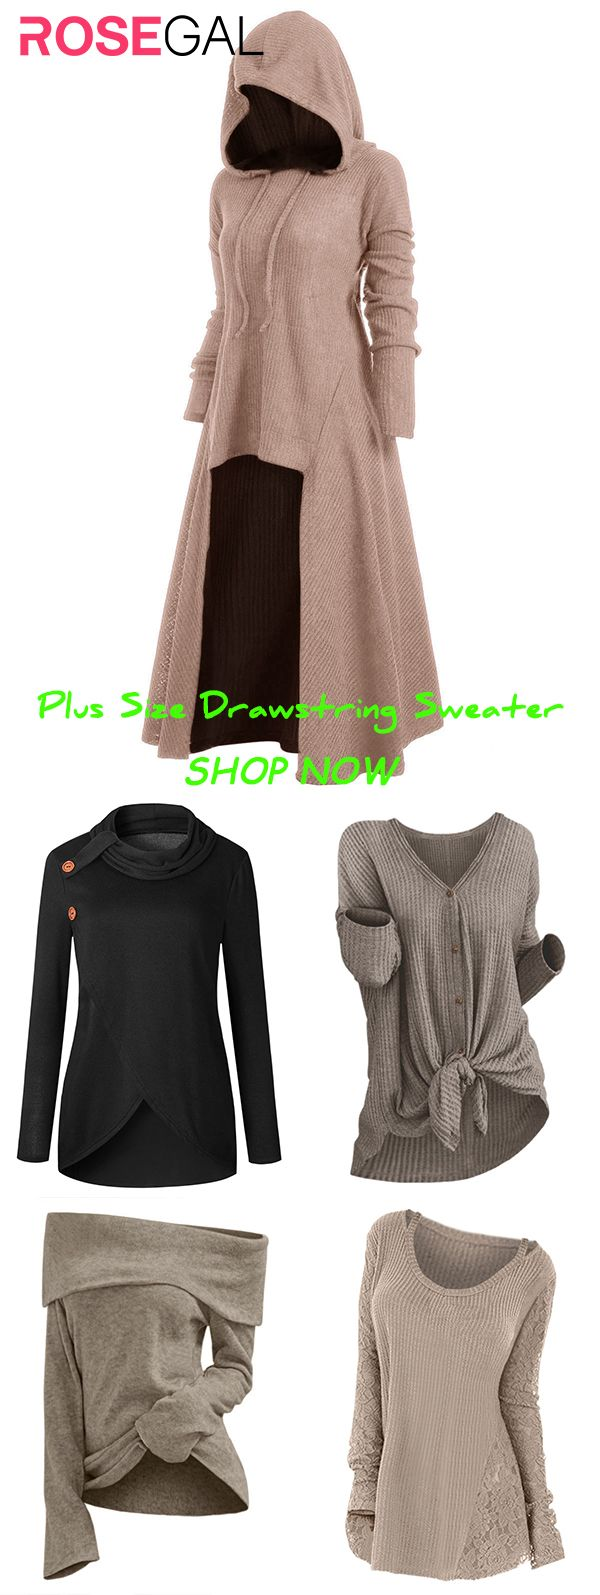 Rosegal Plus Size Drawstring  Sweater ideas